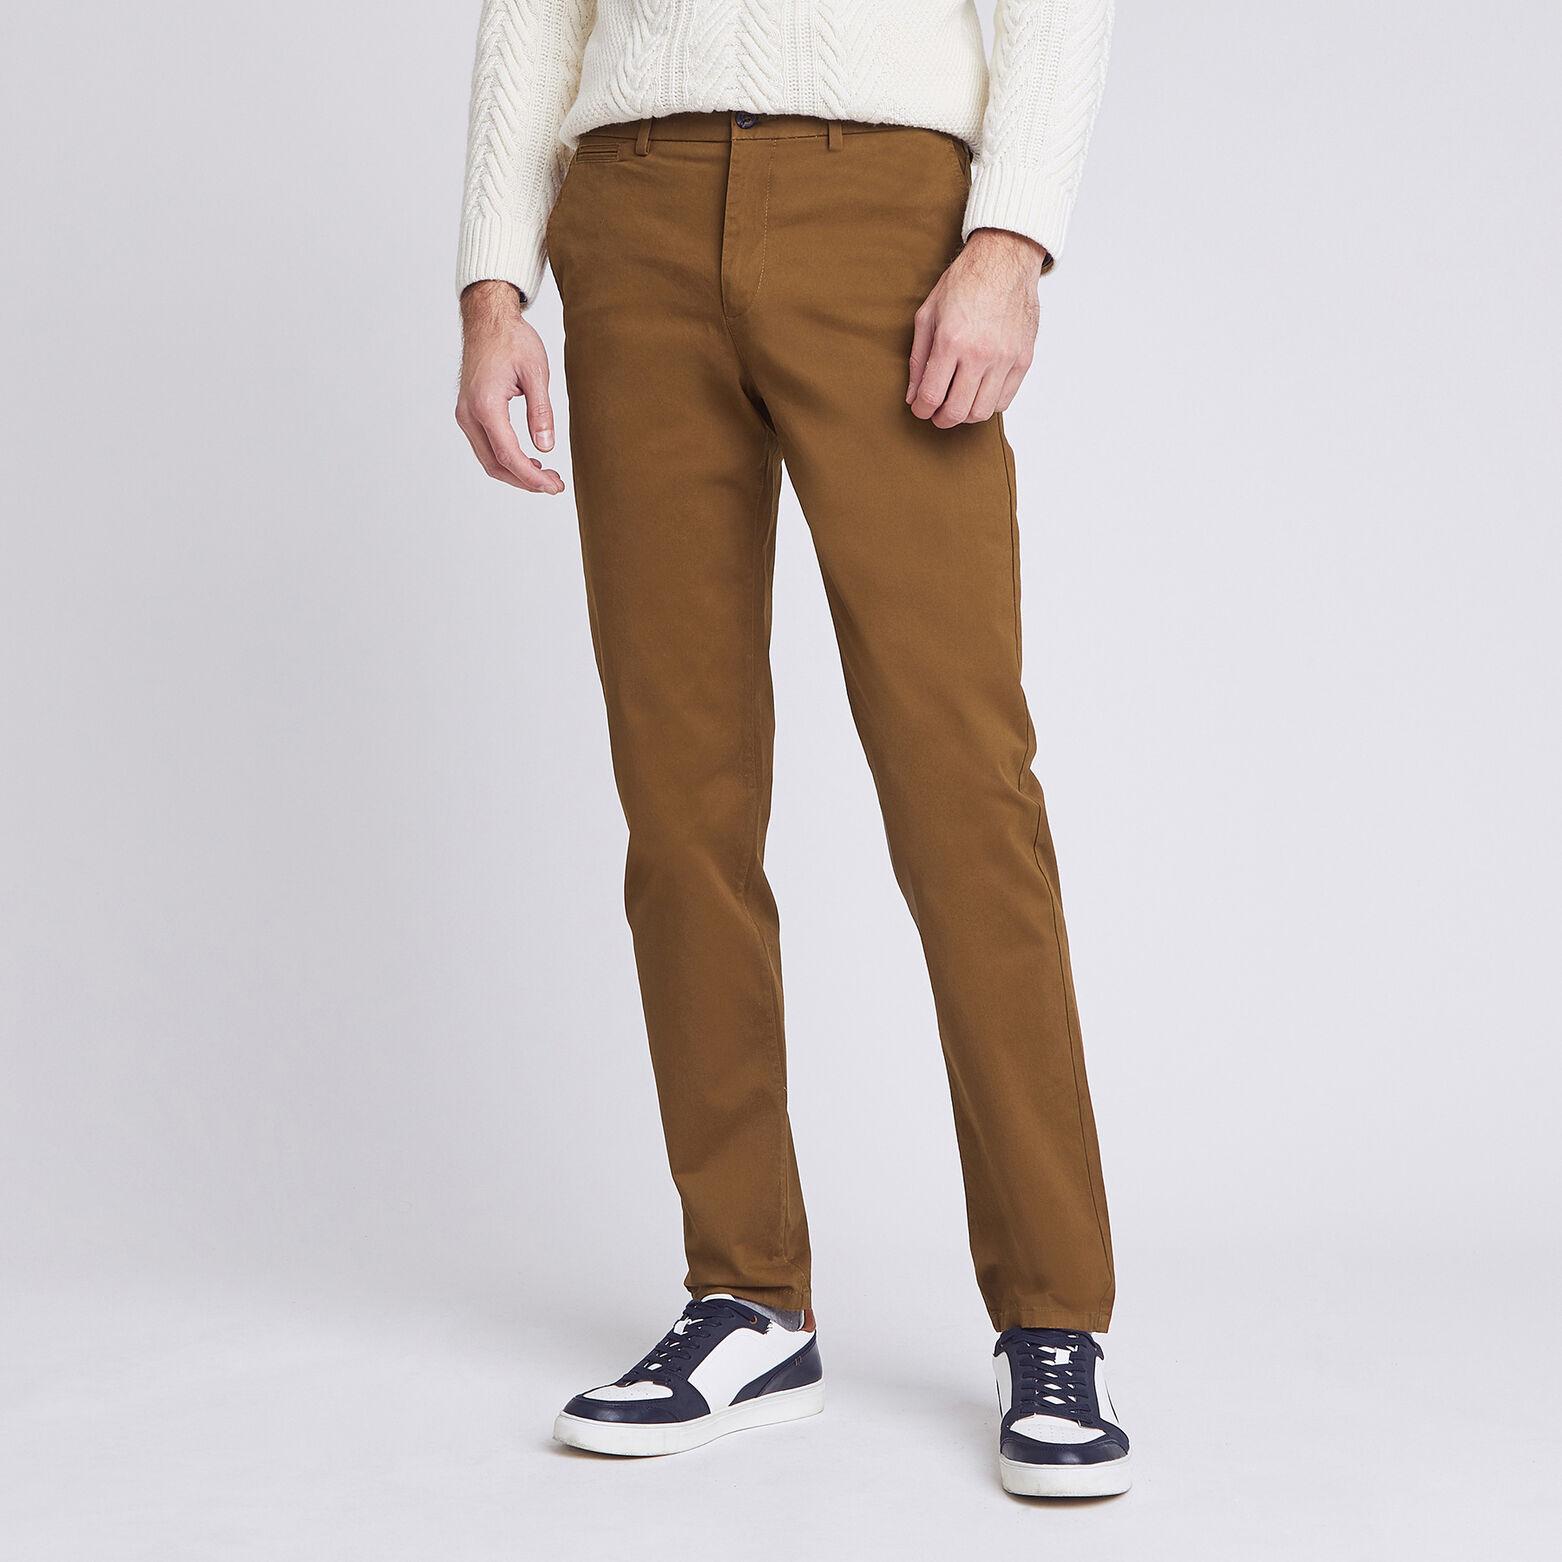 Pantalon chino regular